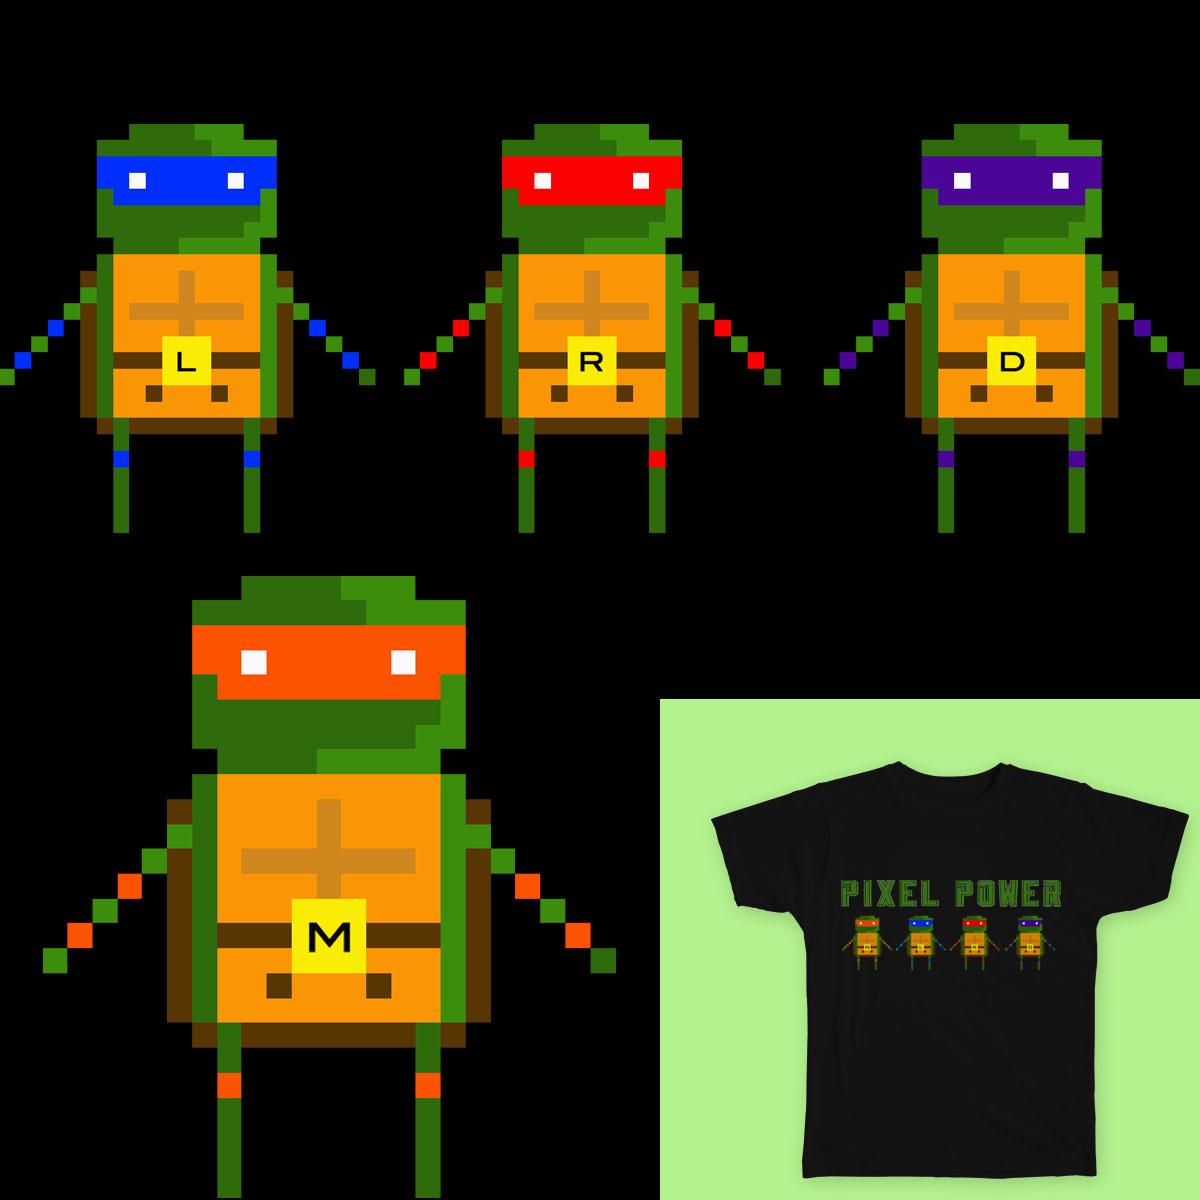 Pixel Power! by heycoffey on Threadless